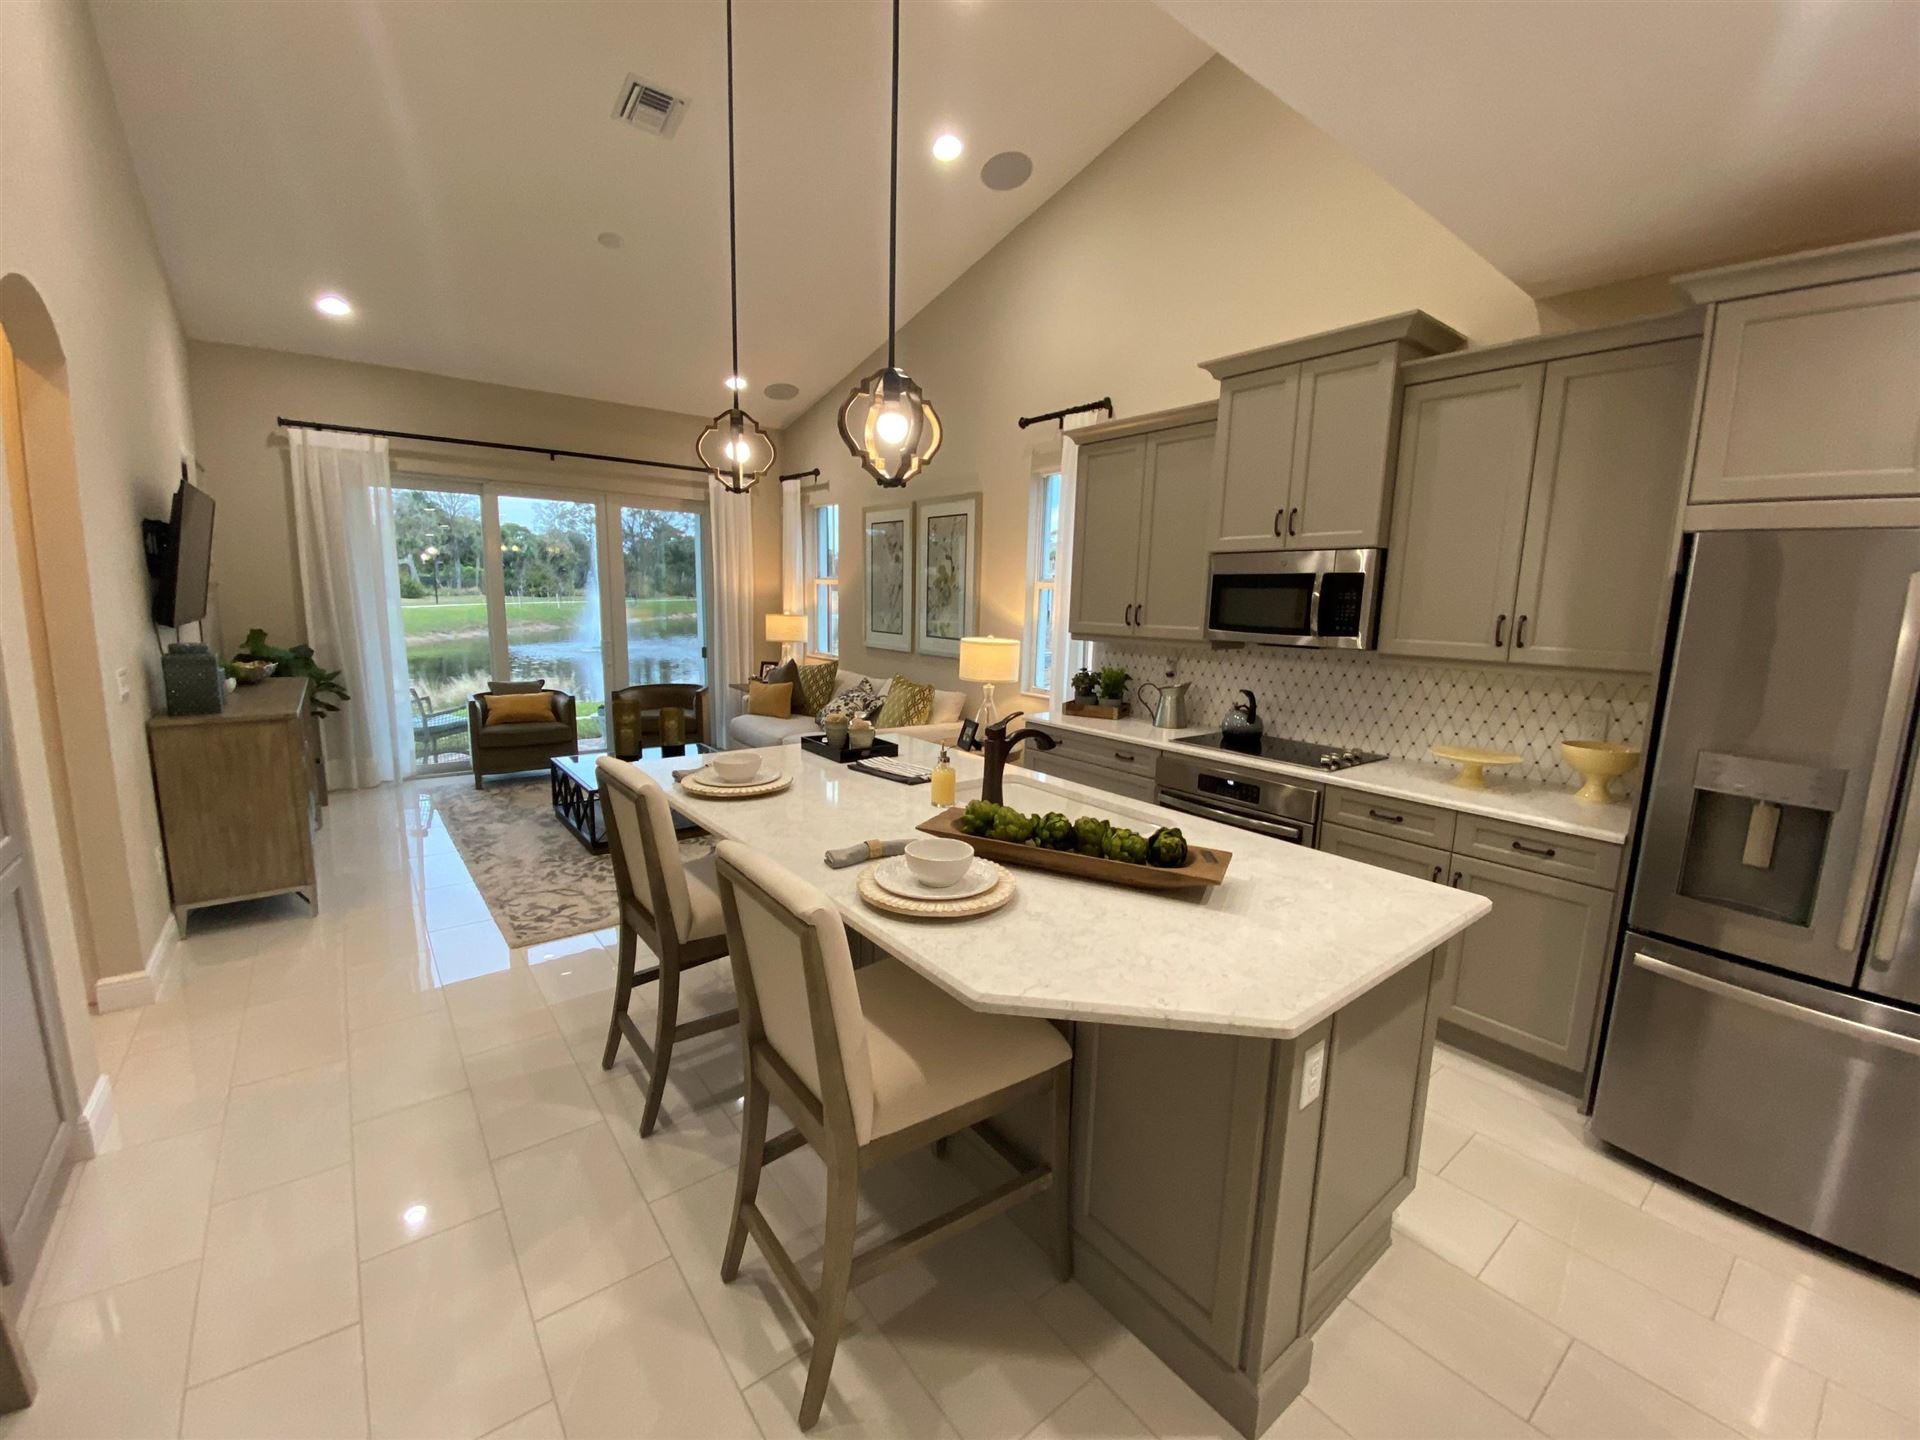 Photo of 12929 Trevi Isle Drive #36, Palm Beach Gardens, FL 33418 (MLS # RX-10685232)